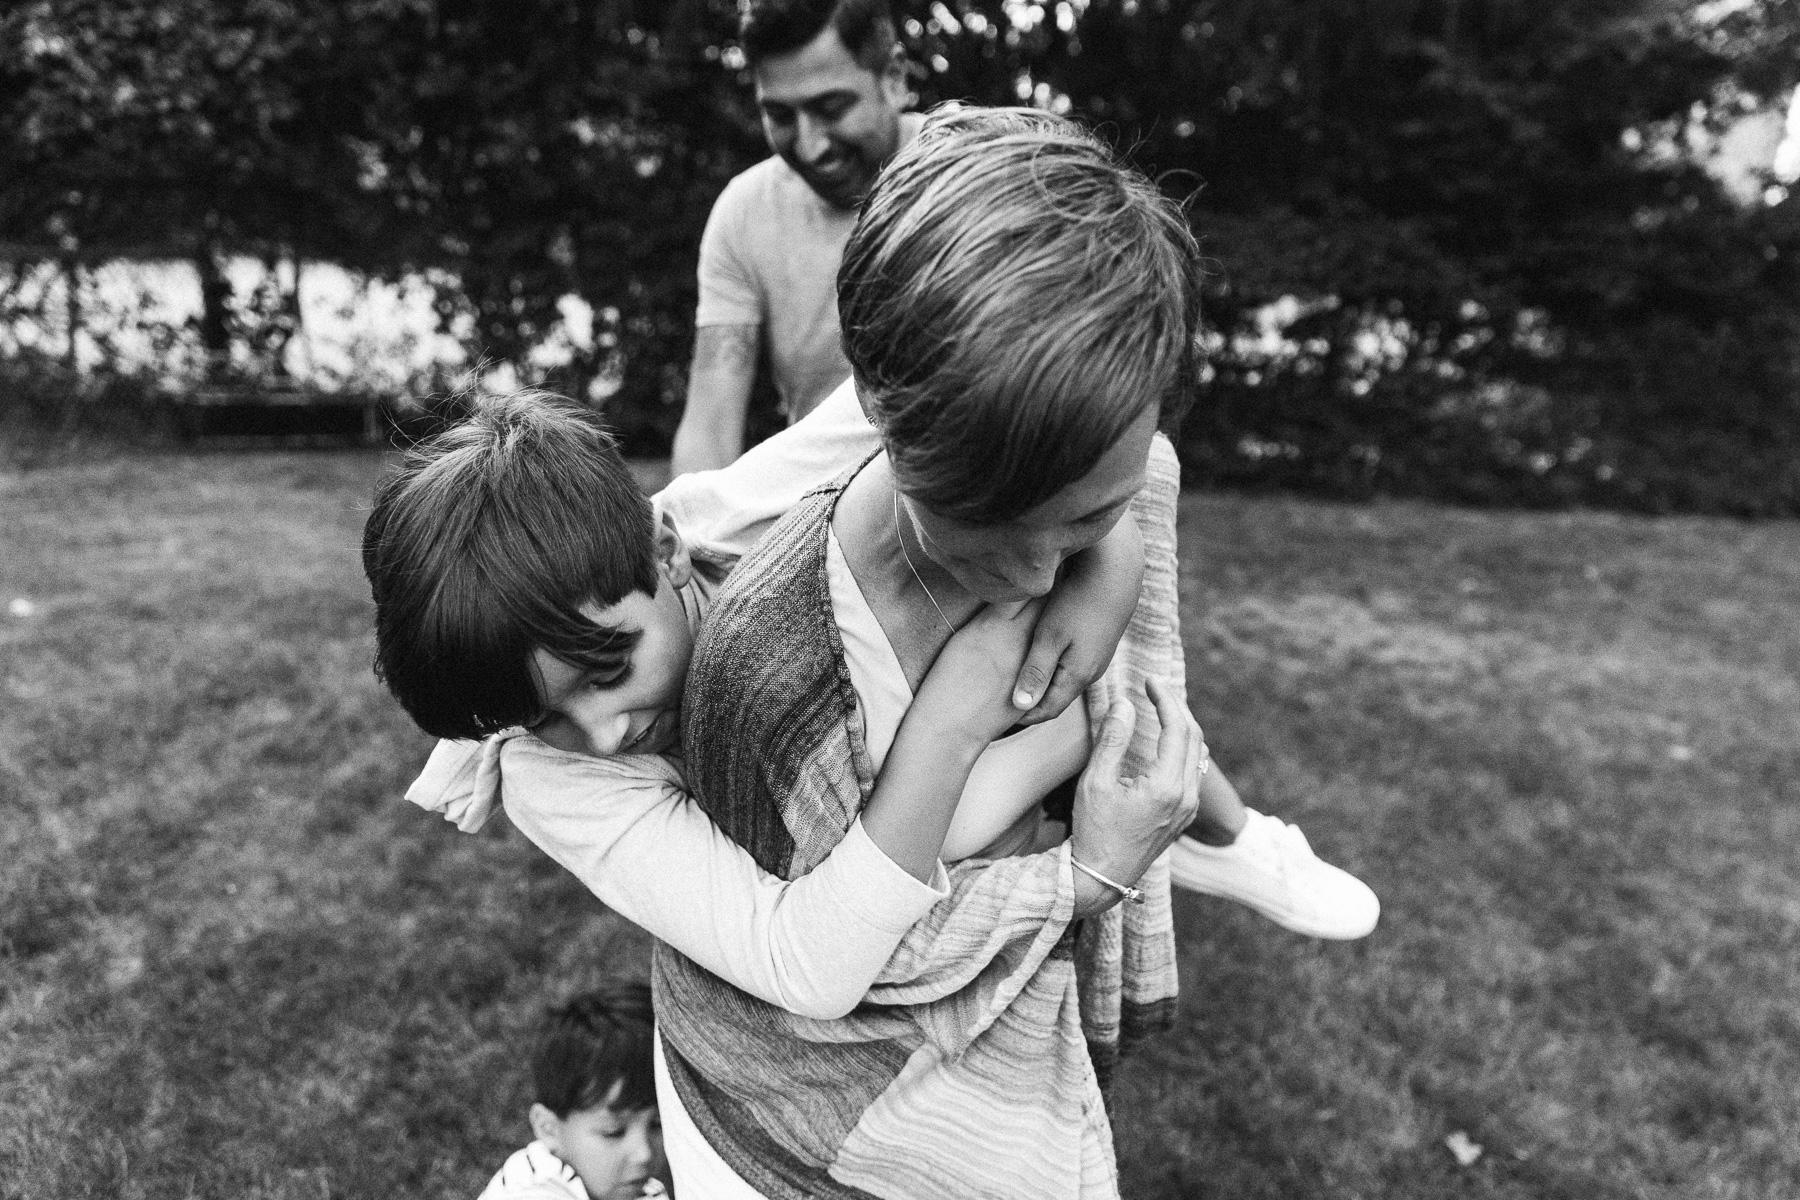 Joyful Family Photography